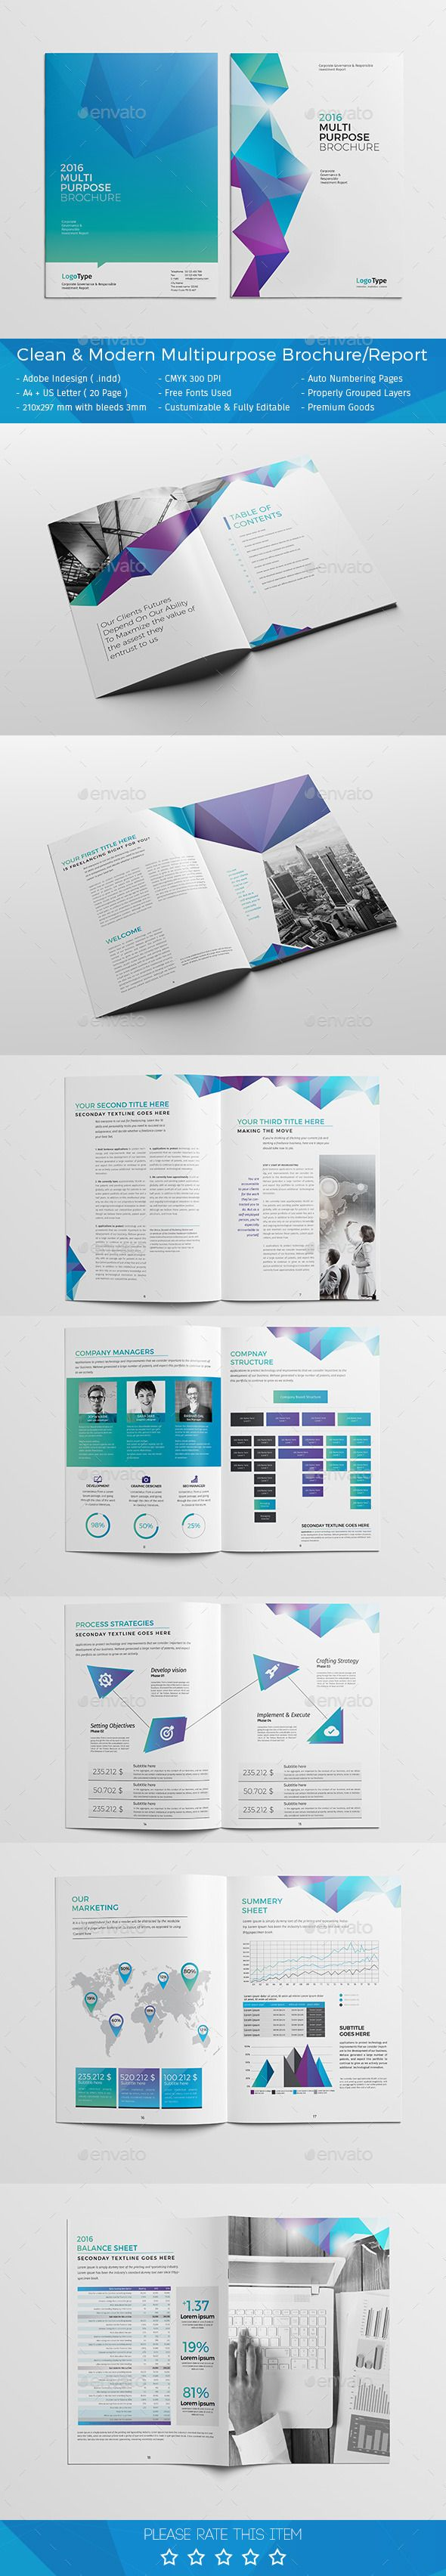 Clean & Modern Multipurpose Brochure/Report — InDesign Template ...